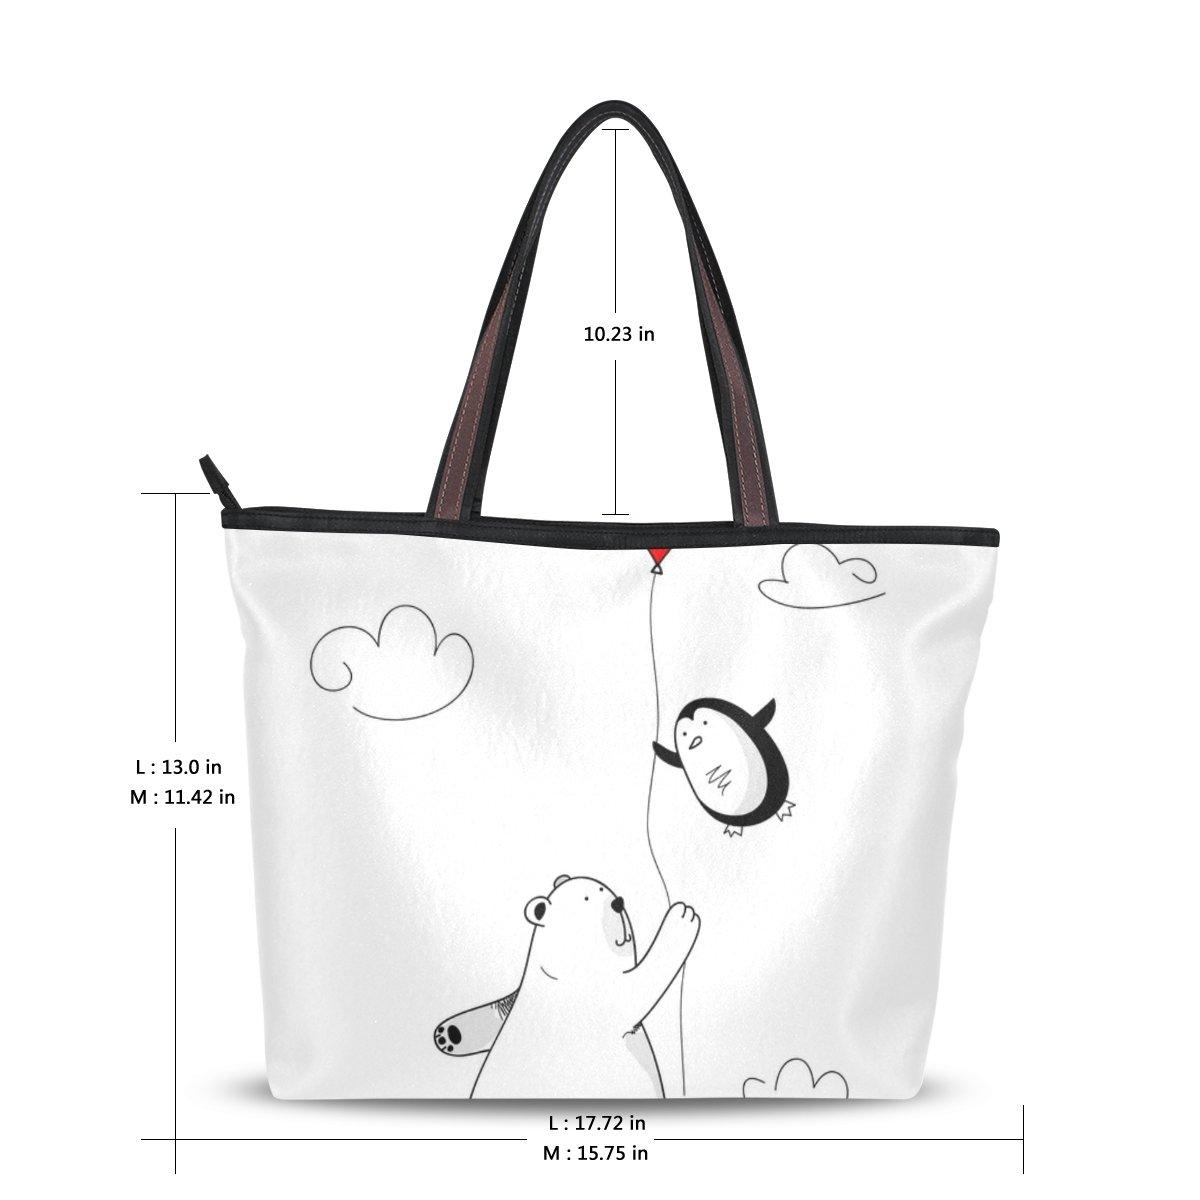 6561a5efa5 Amazon.com  Cooper girl Bear With Heart Balloon Tote Bag Top Handle Handbag  Shoulder Bag Large Capacity  Shoes